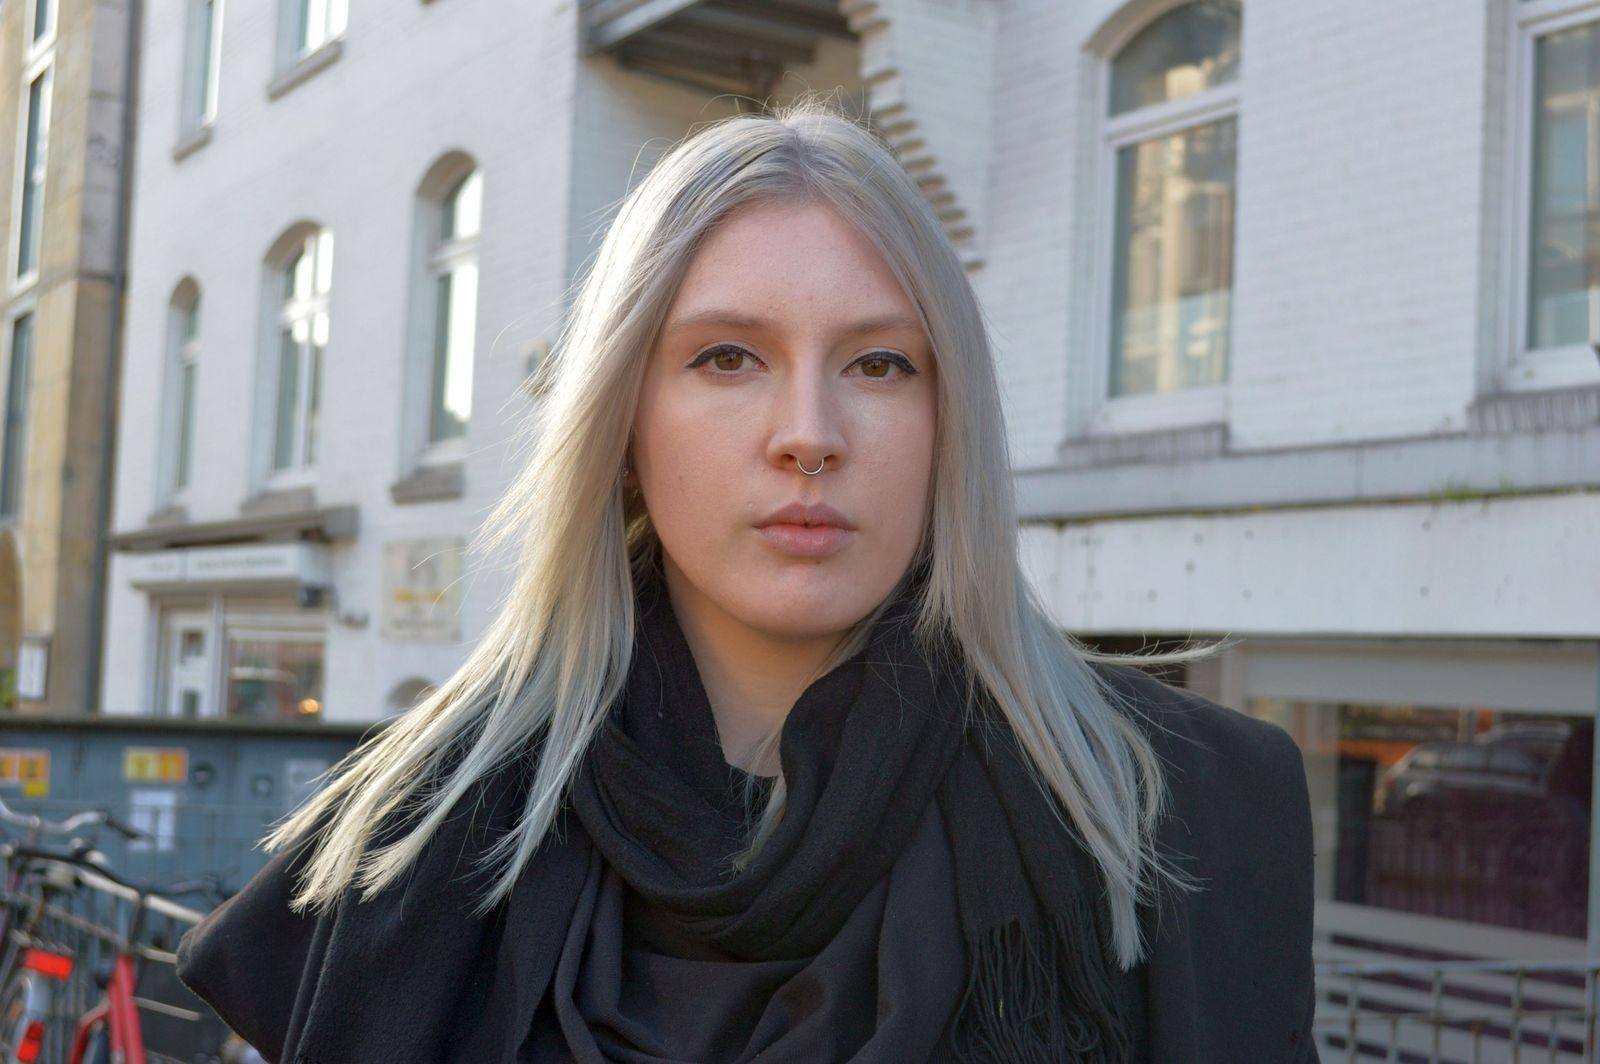 Sarah Rambatz Shitstorm